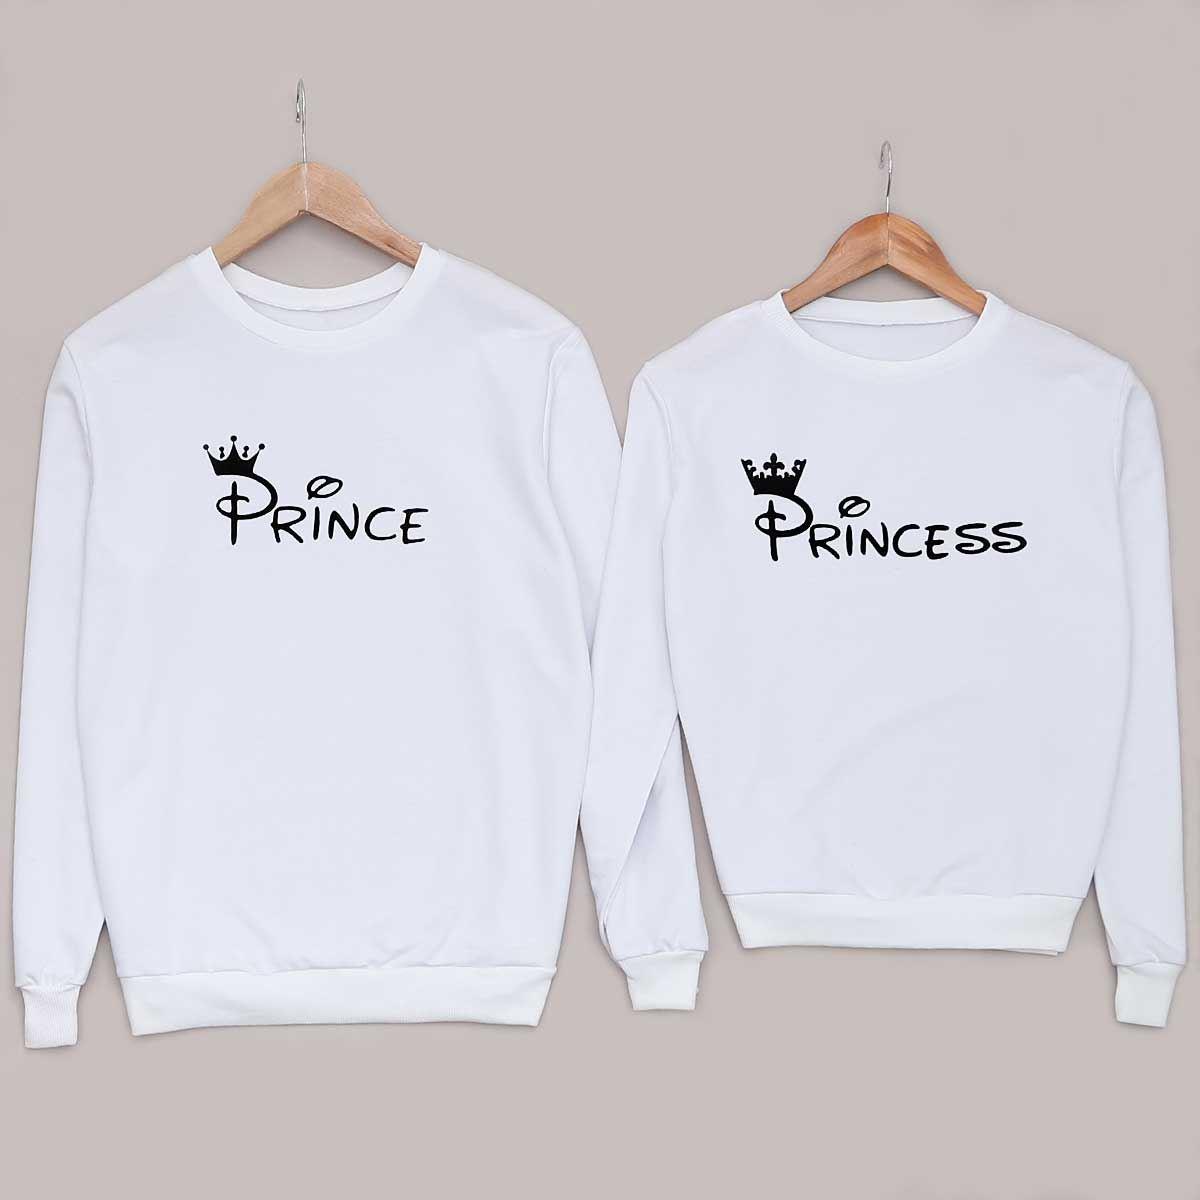 Prince-Princess Beyaz Sevgili Kombini SVG249